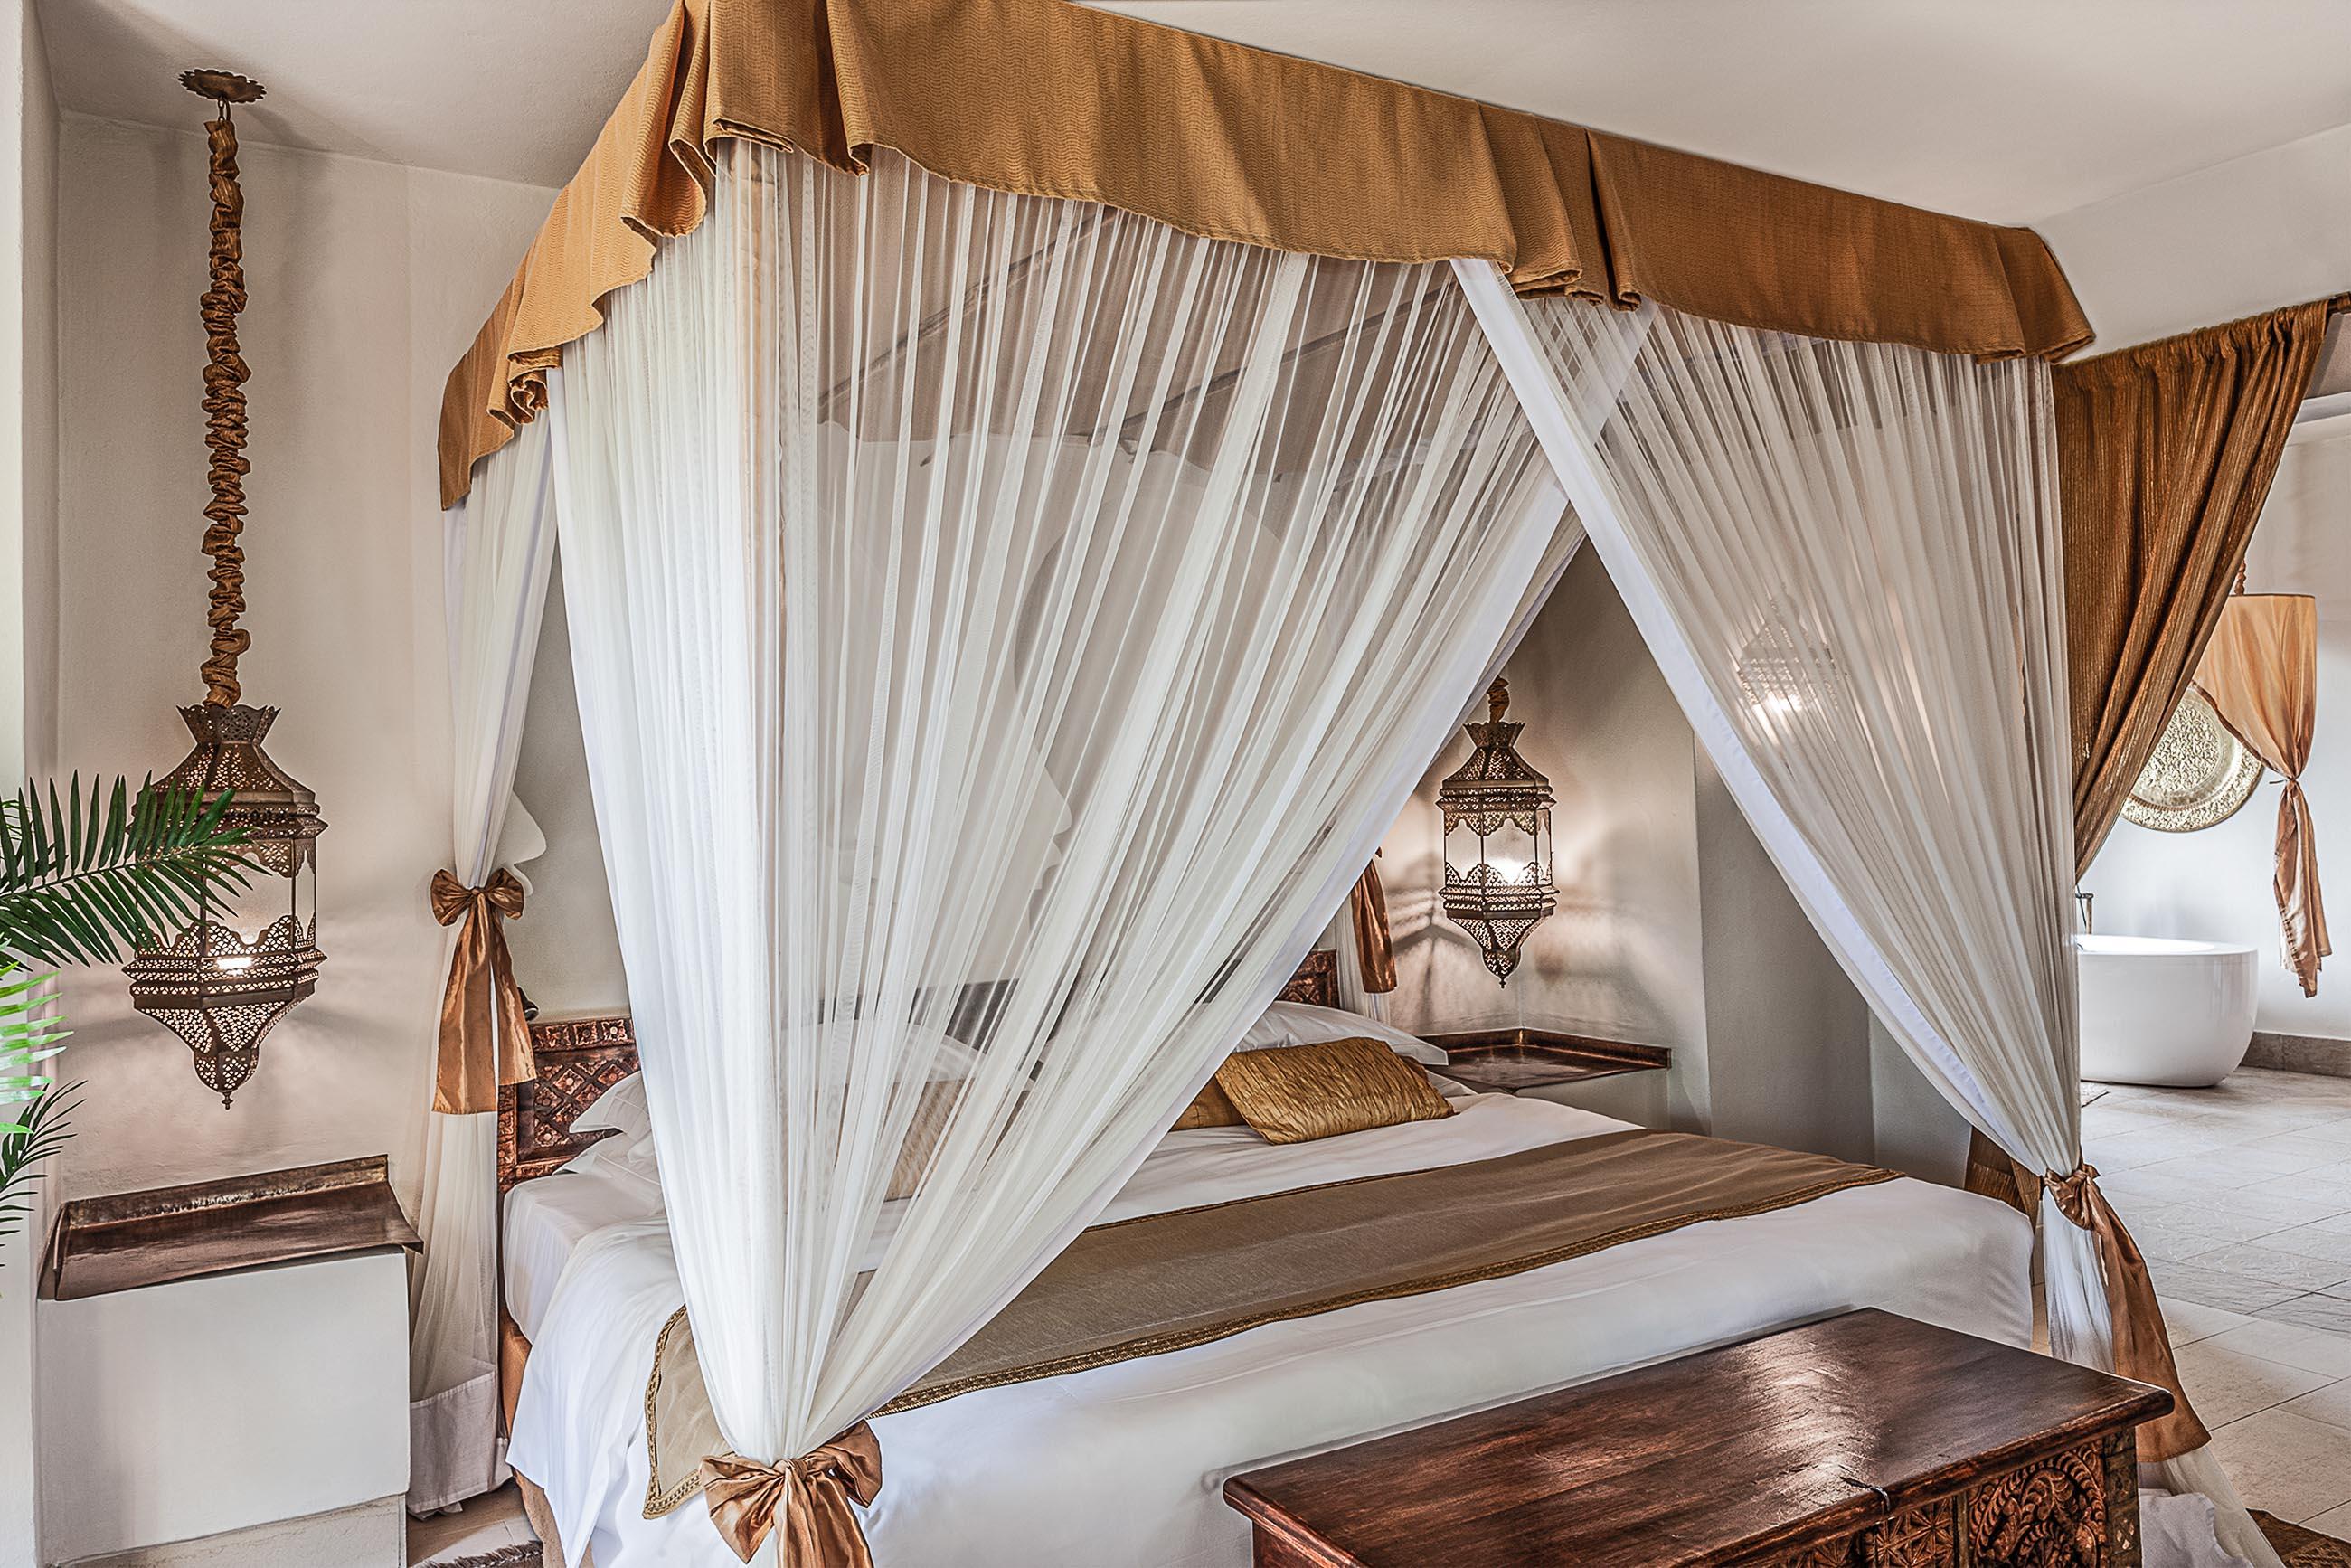 https://bubo.sk/uploads/galleries/19778/baraza-one-bedroom-villa.jpg